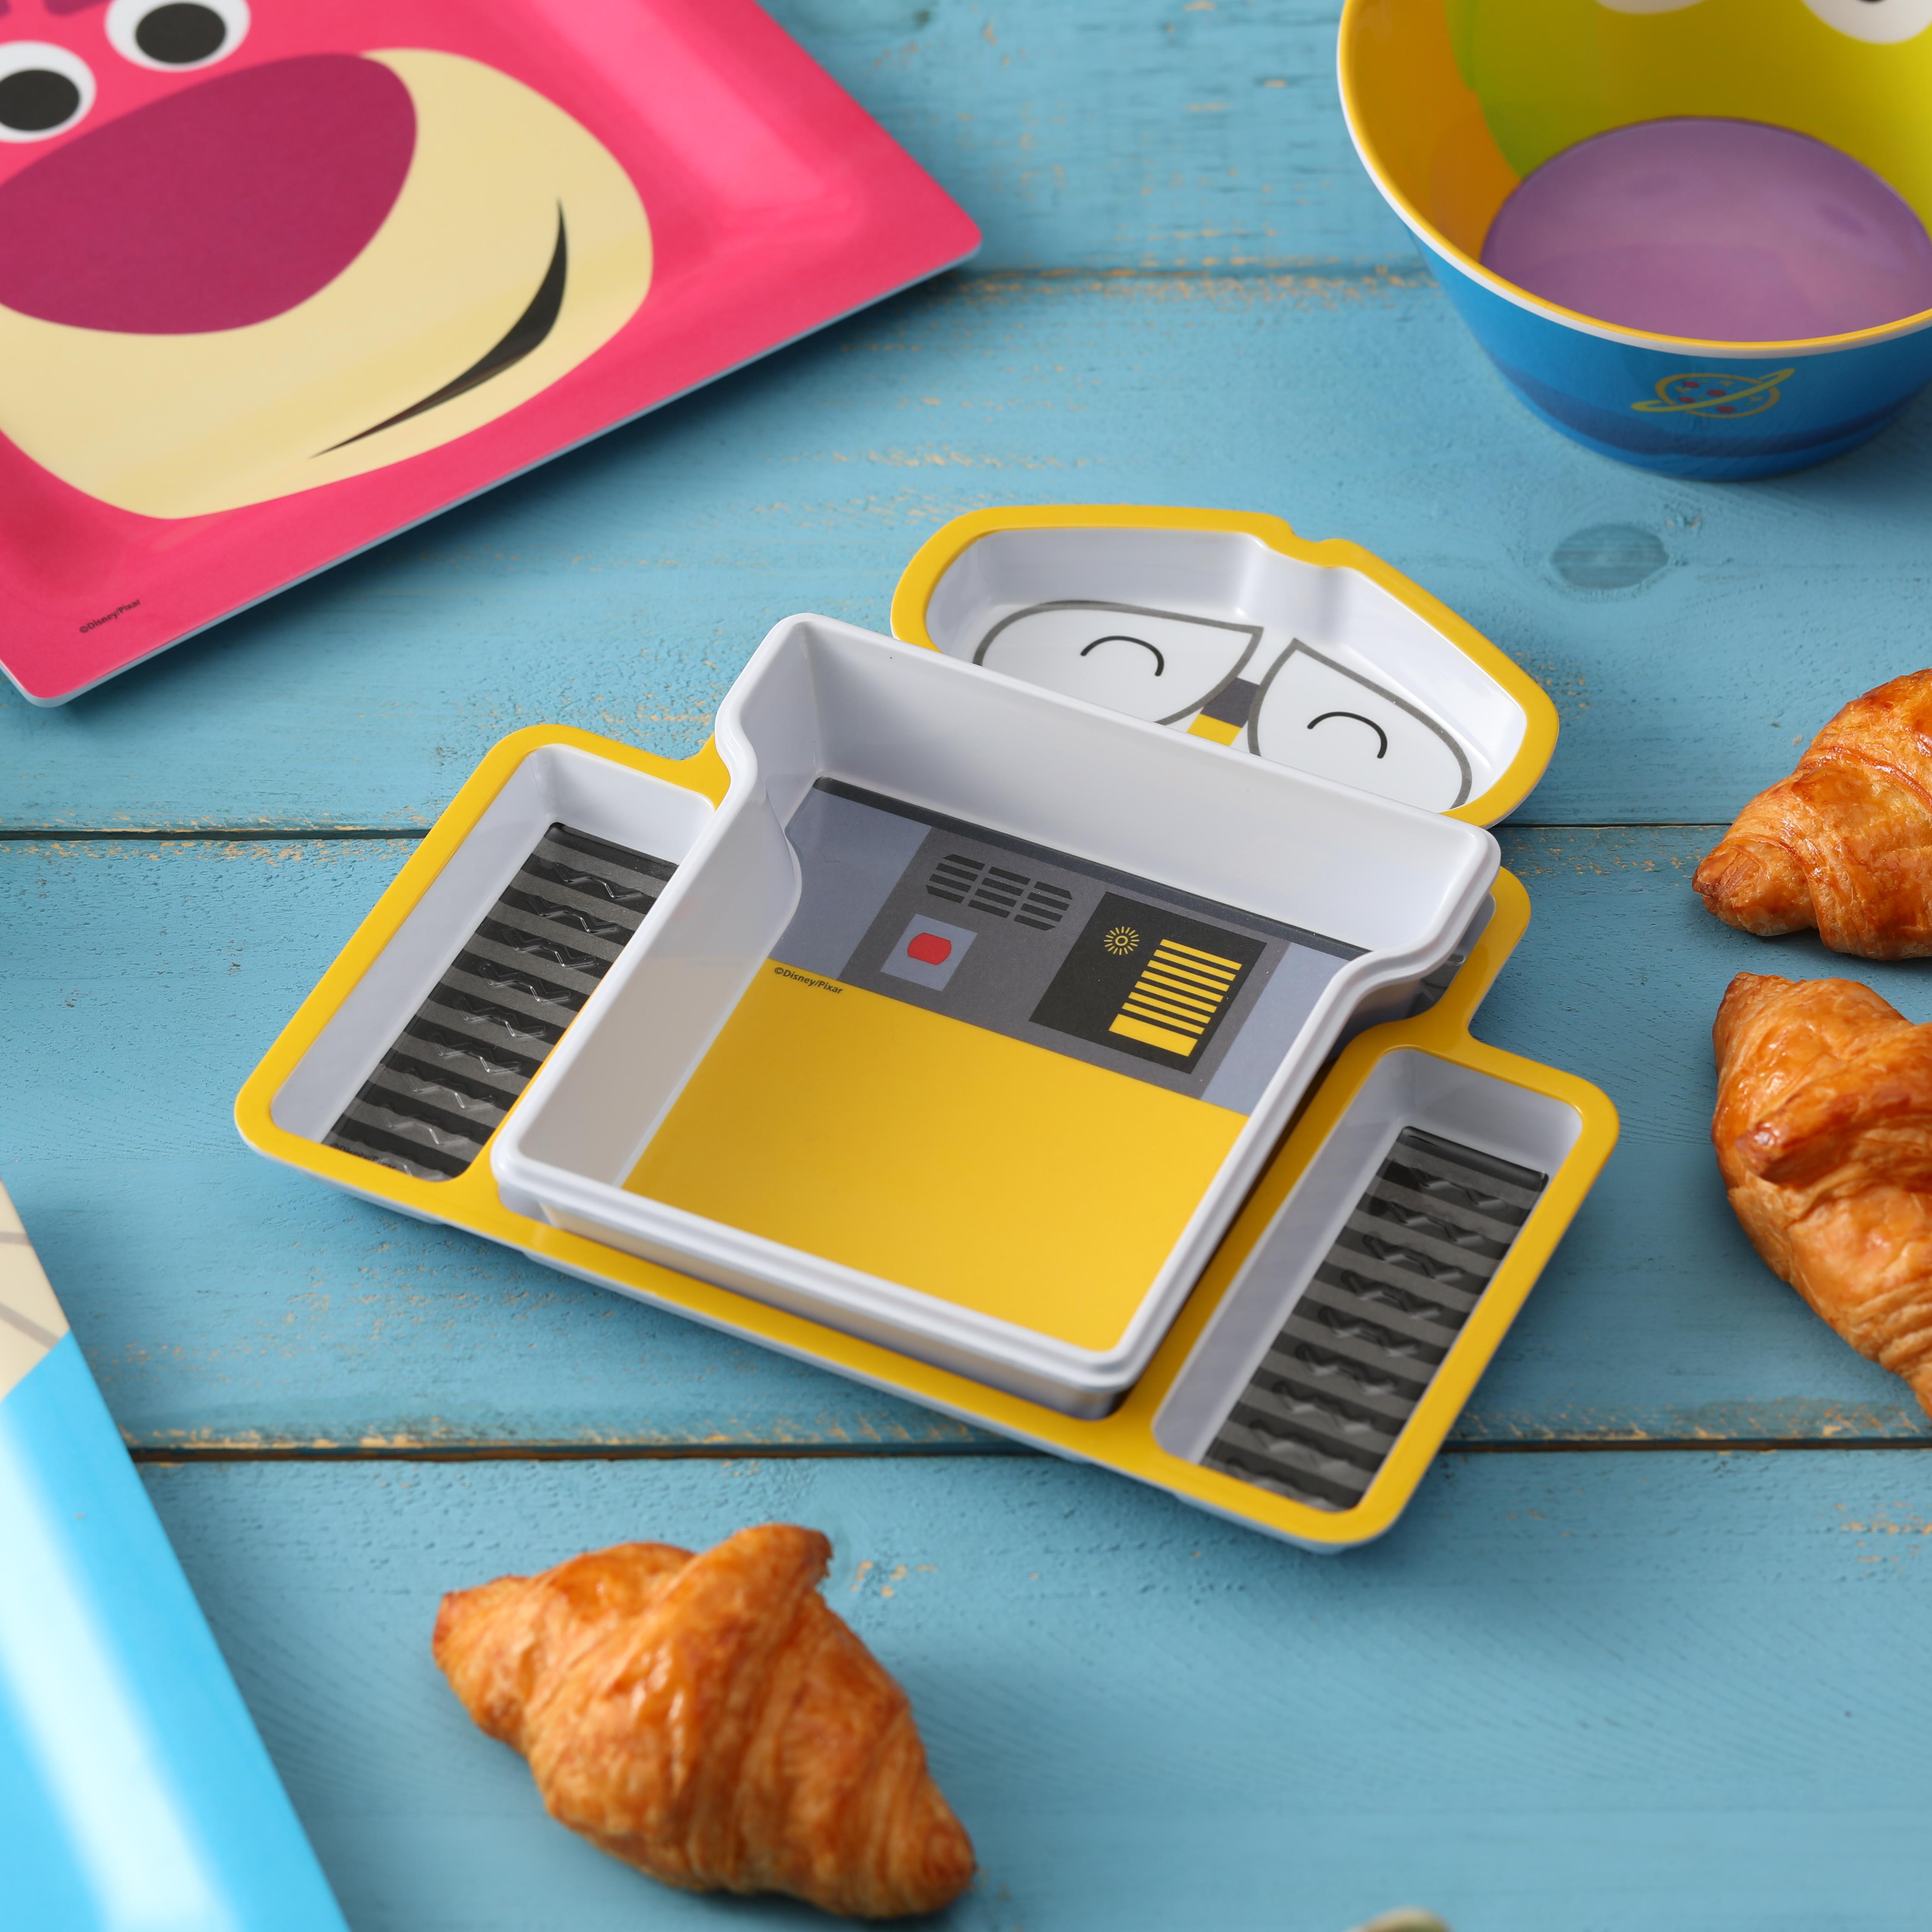 Disney and Pixar Plate and Bowl Set, Wall-E, 2-piece set slideshow image 2